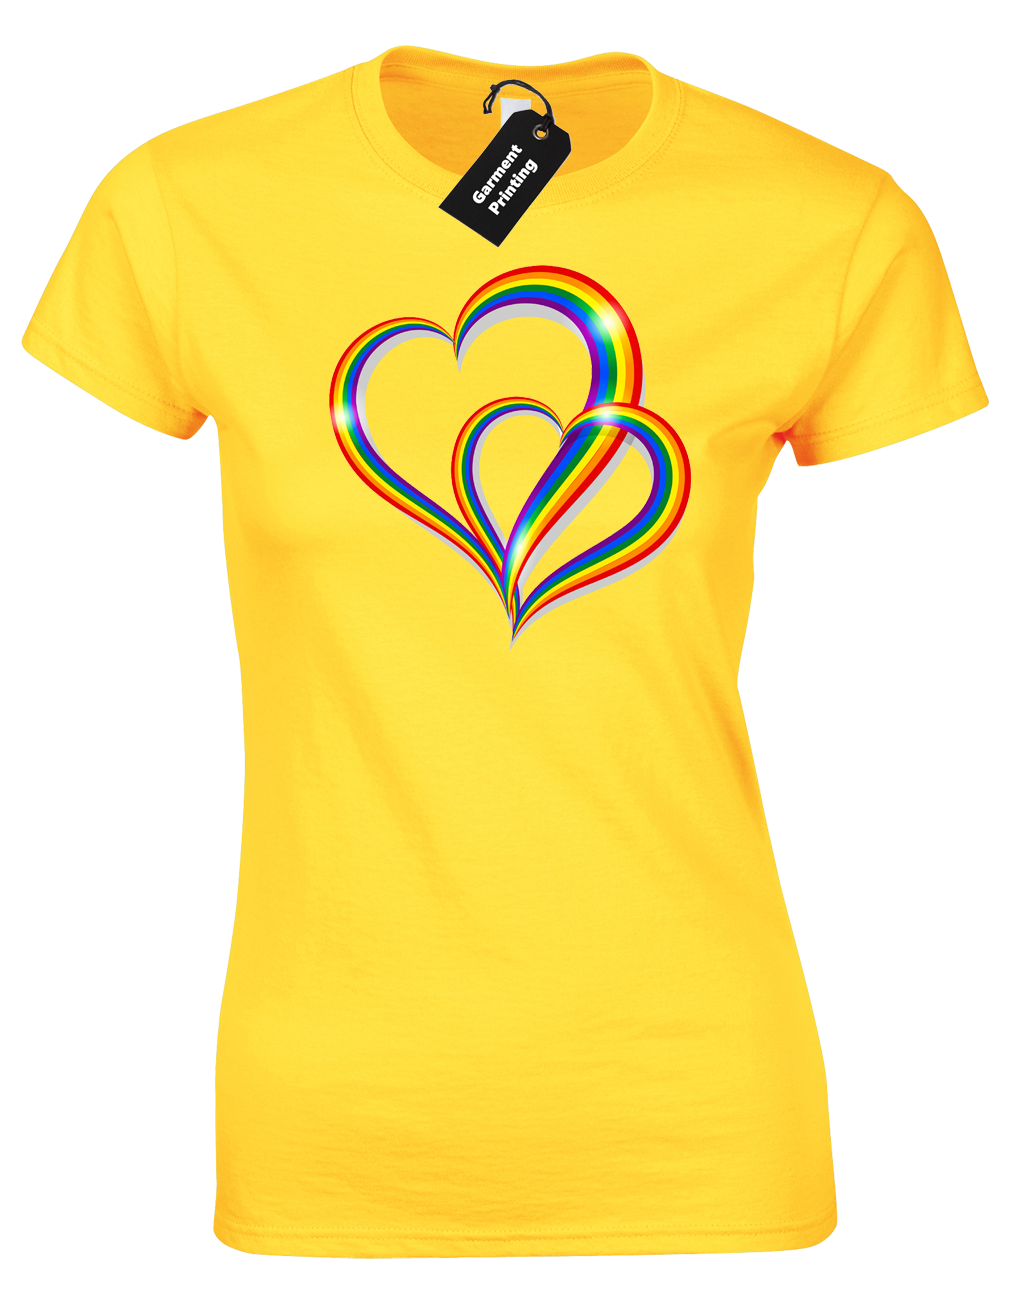 2 Pride Hearts Ladies T-Shirt Gay Lesbian Lgbt Unisex Rainbow Womens Top ( Col) 3